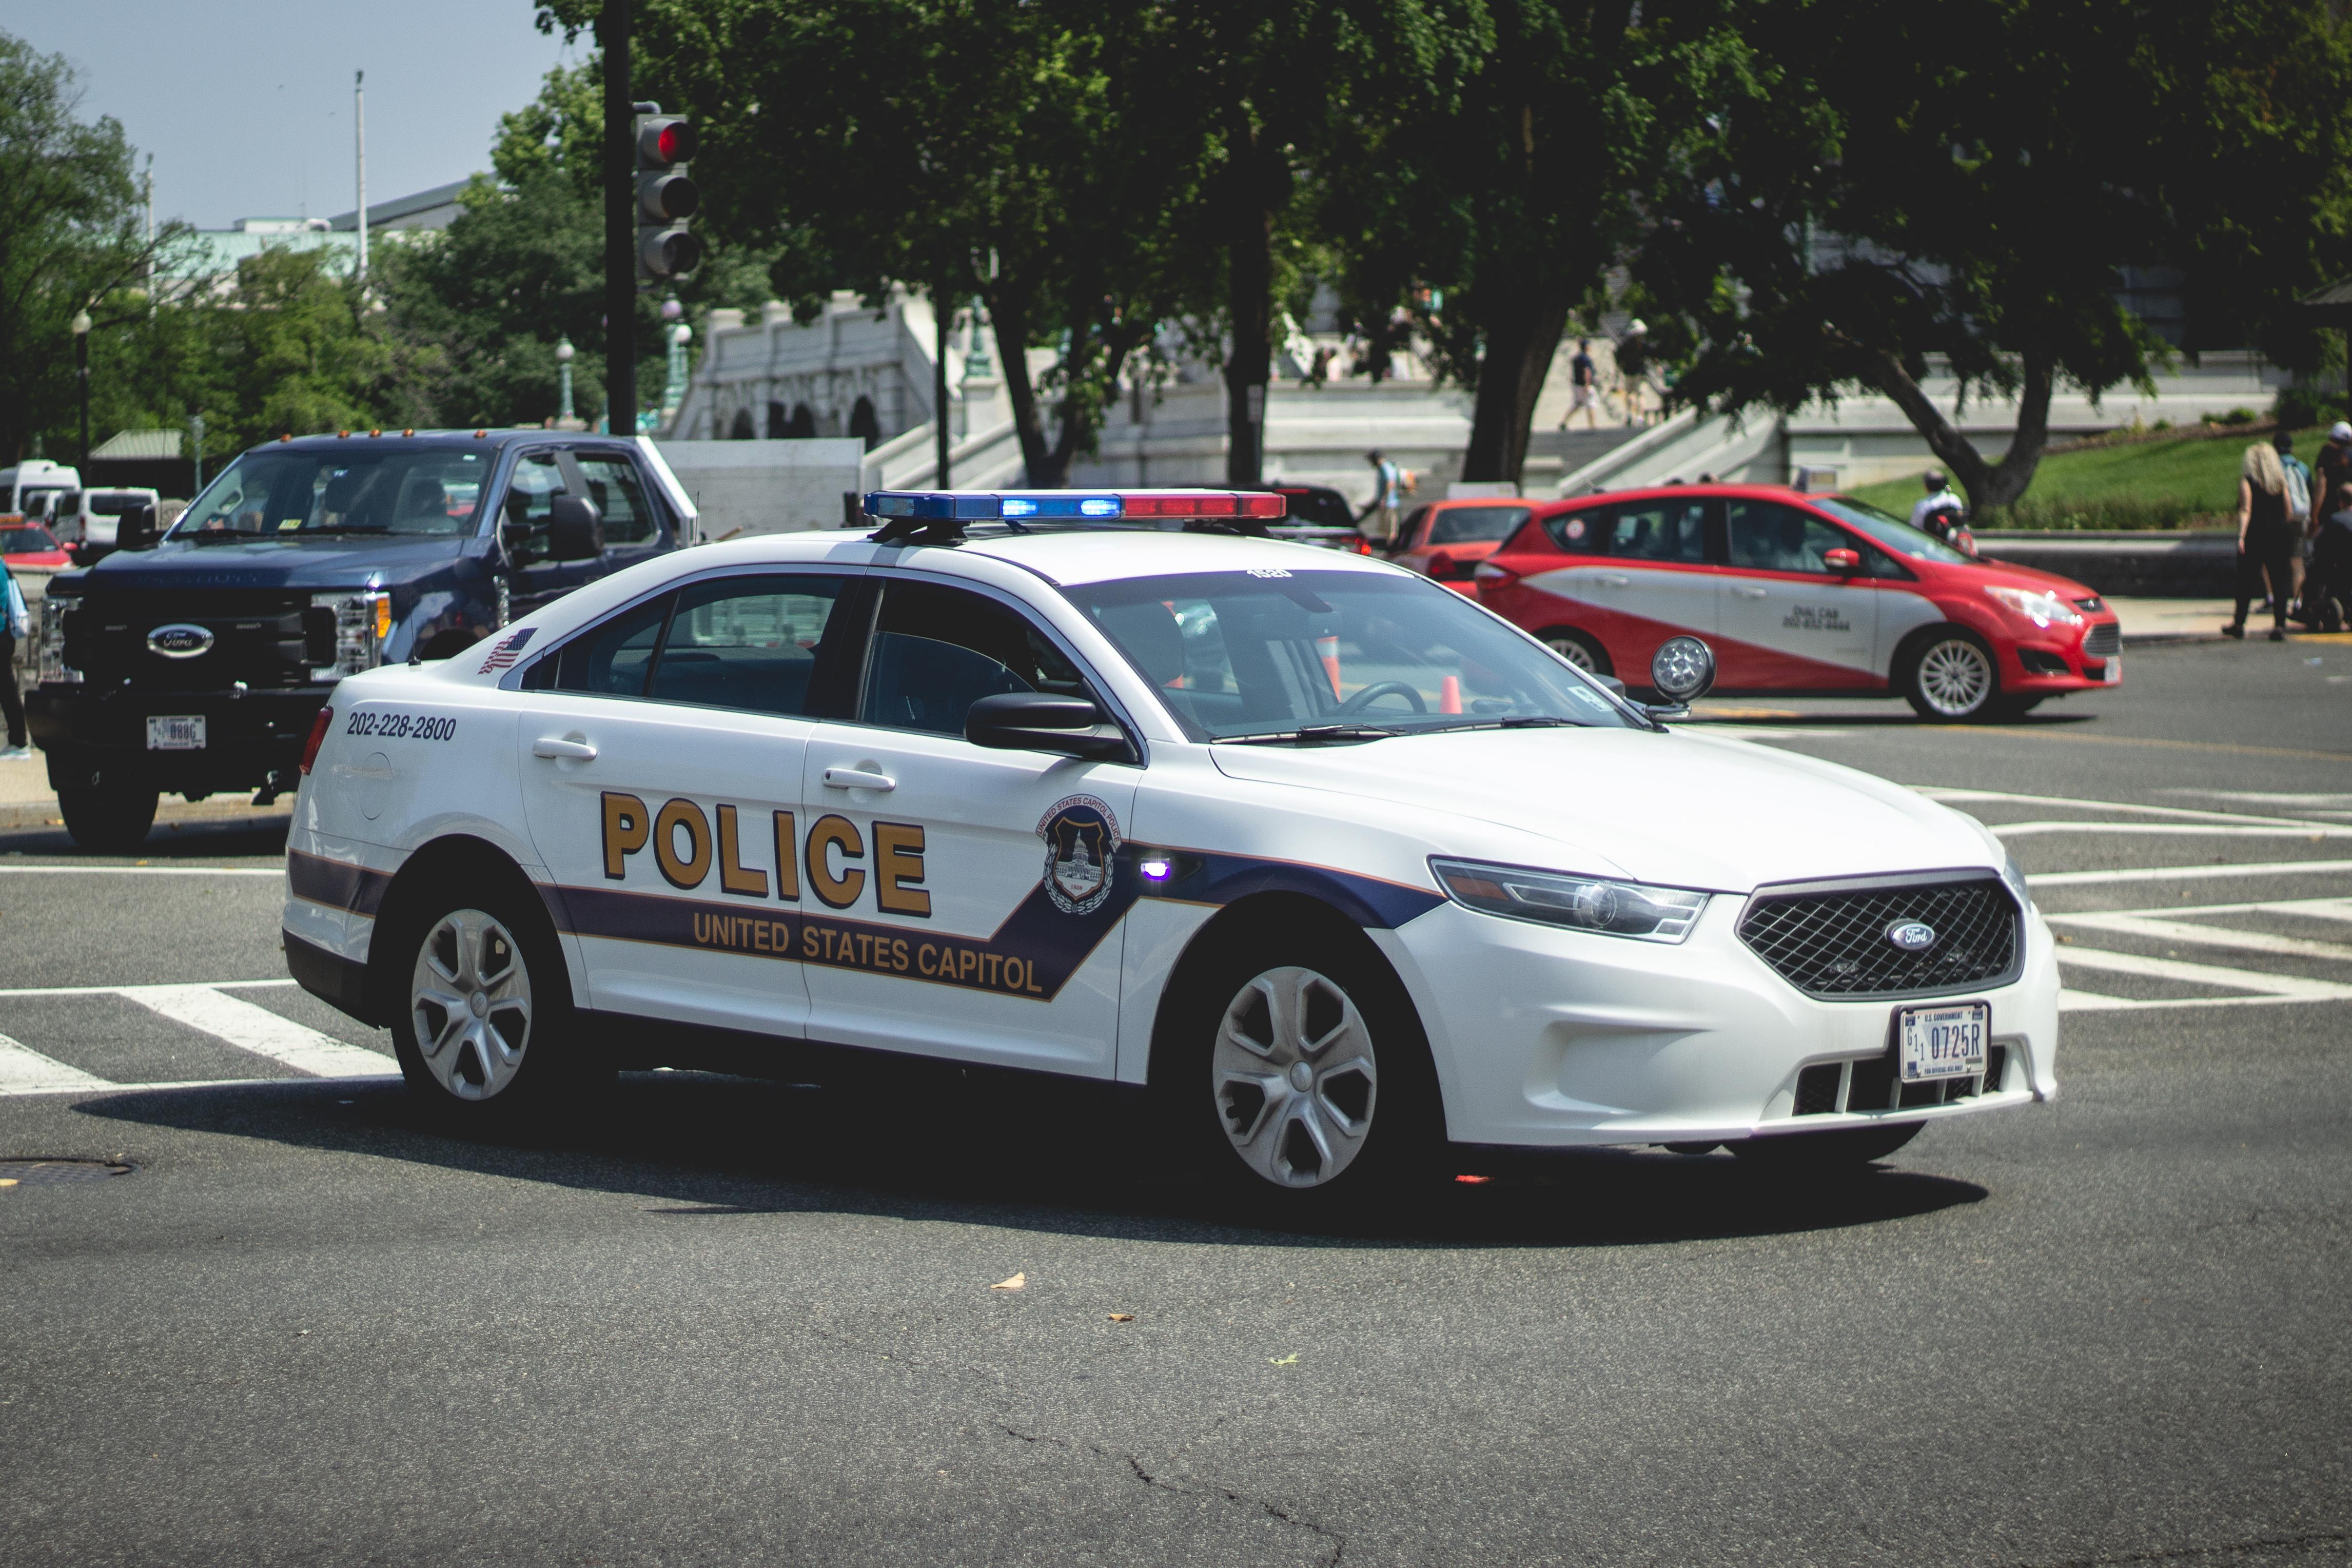 Us capitol police - ford interceptor sedan photo